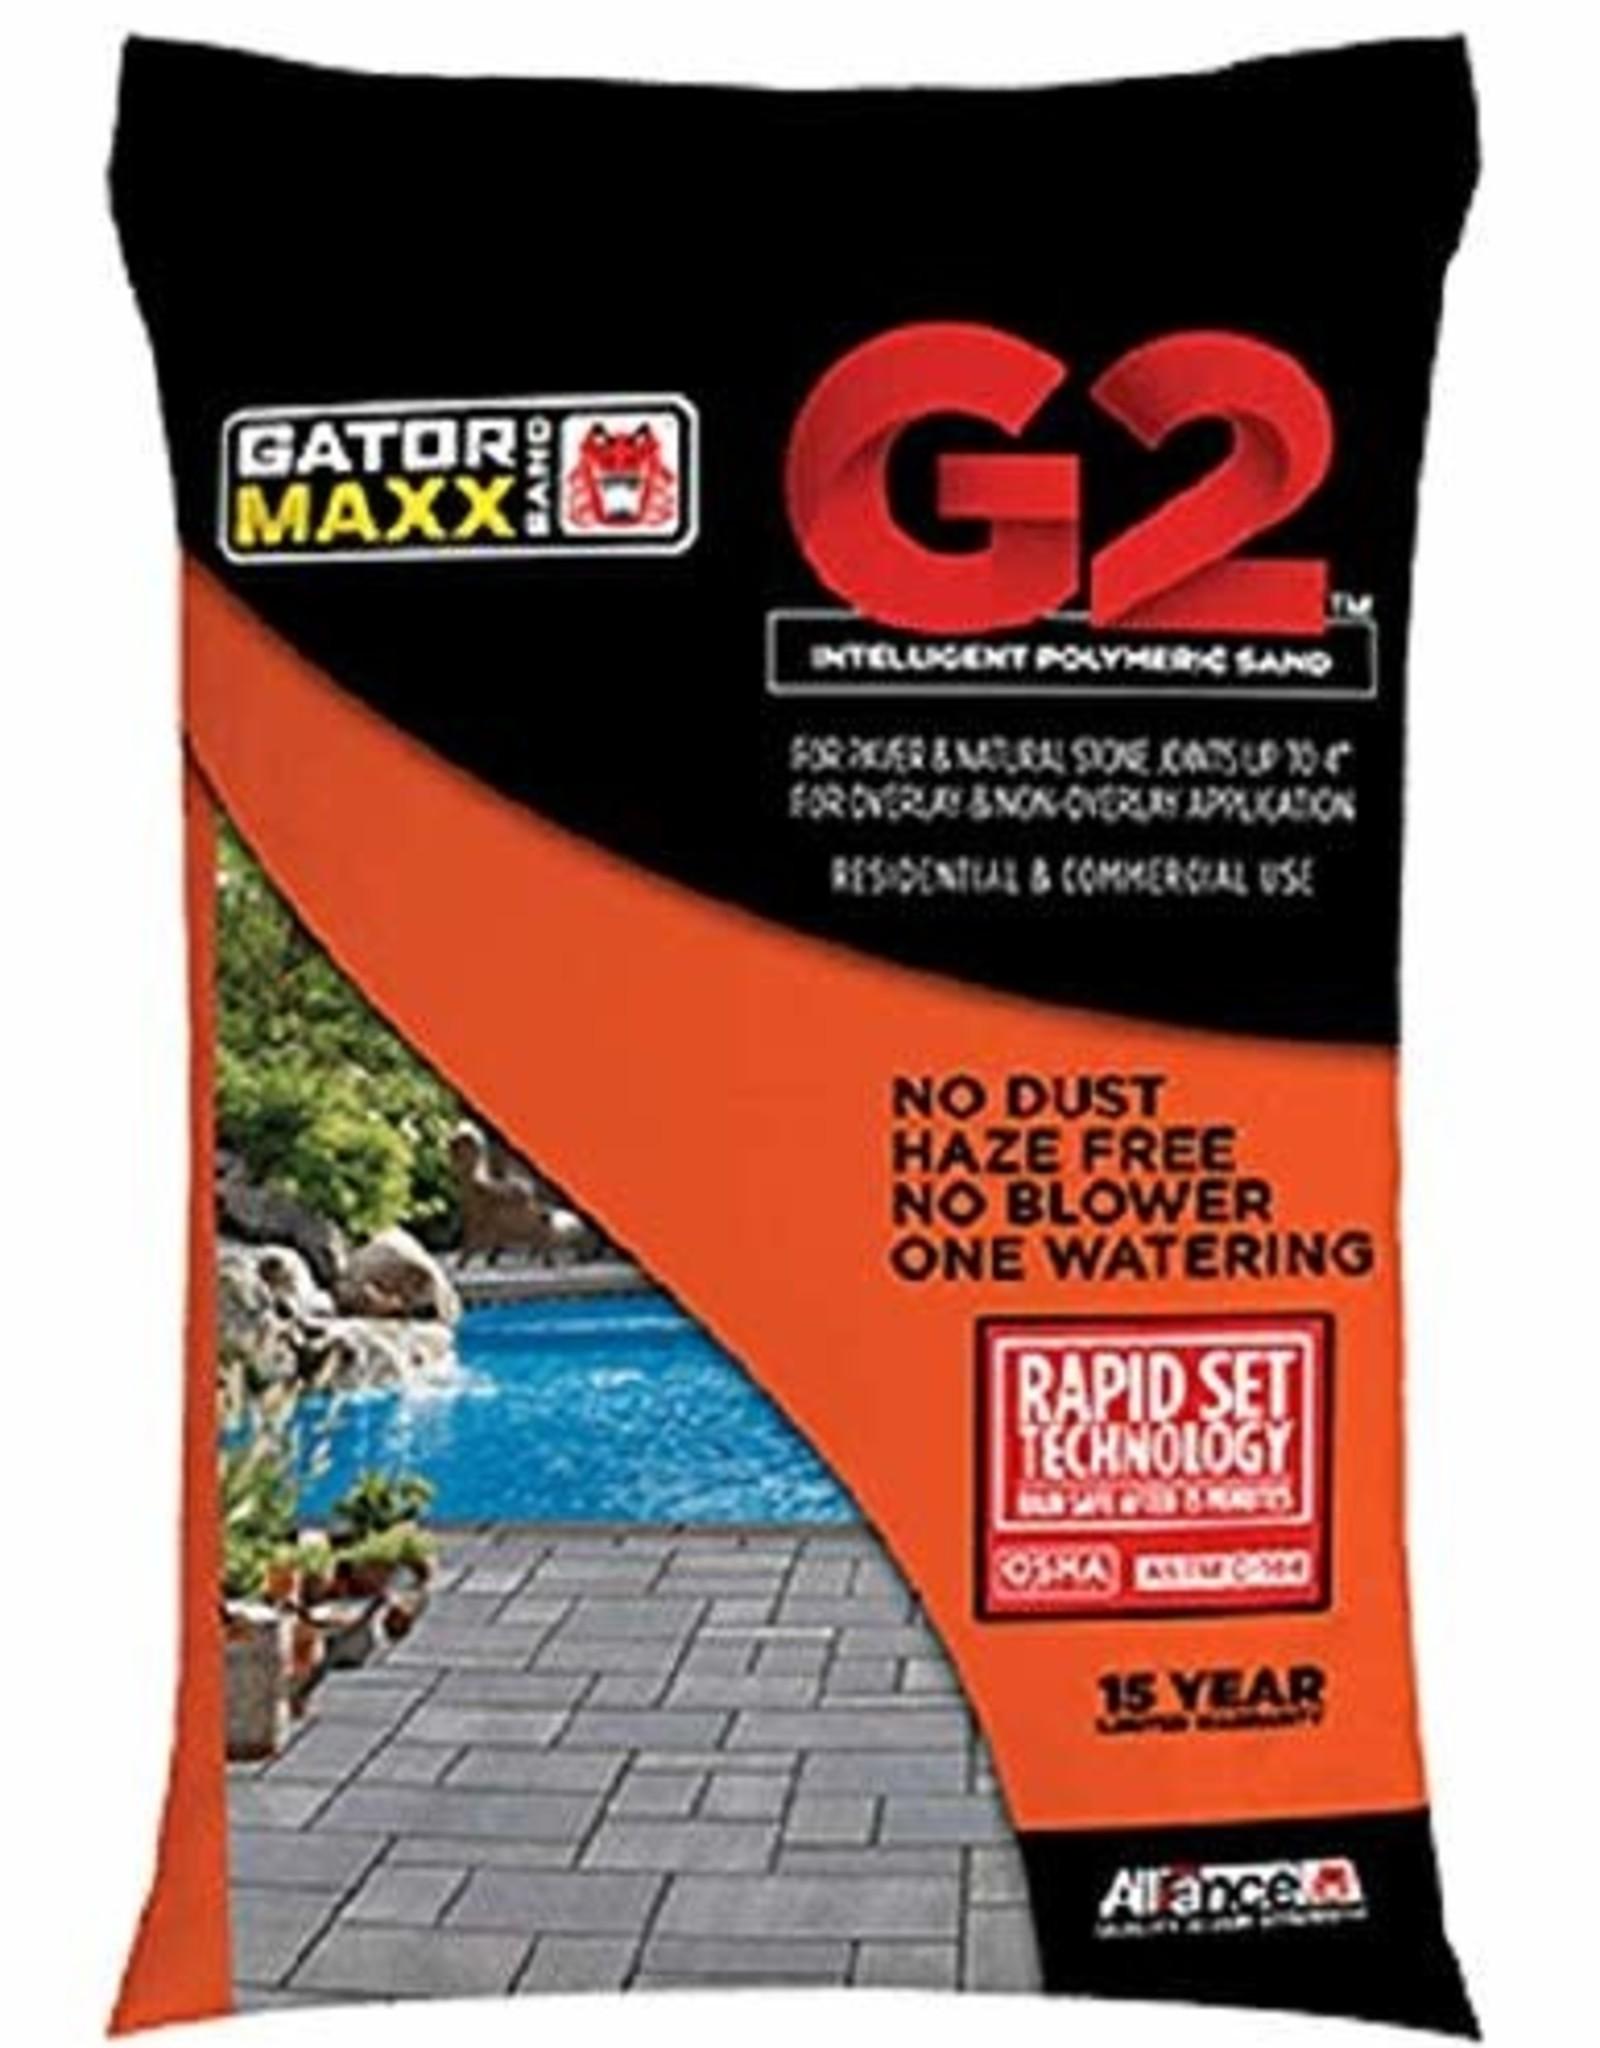 Alliance Designer Products BULK Poly Sand - Alliance Gator Max Bond G2 Ivory 50 lb